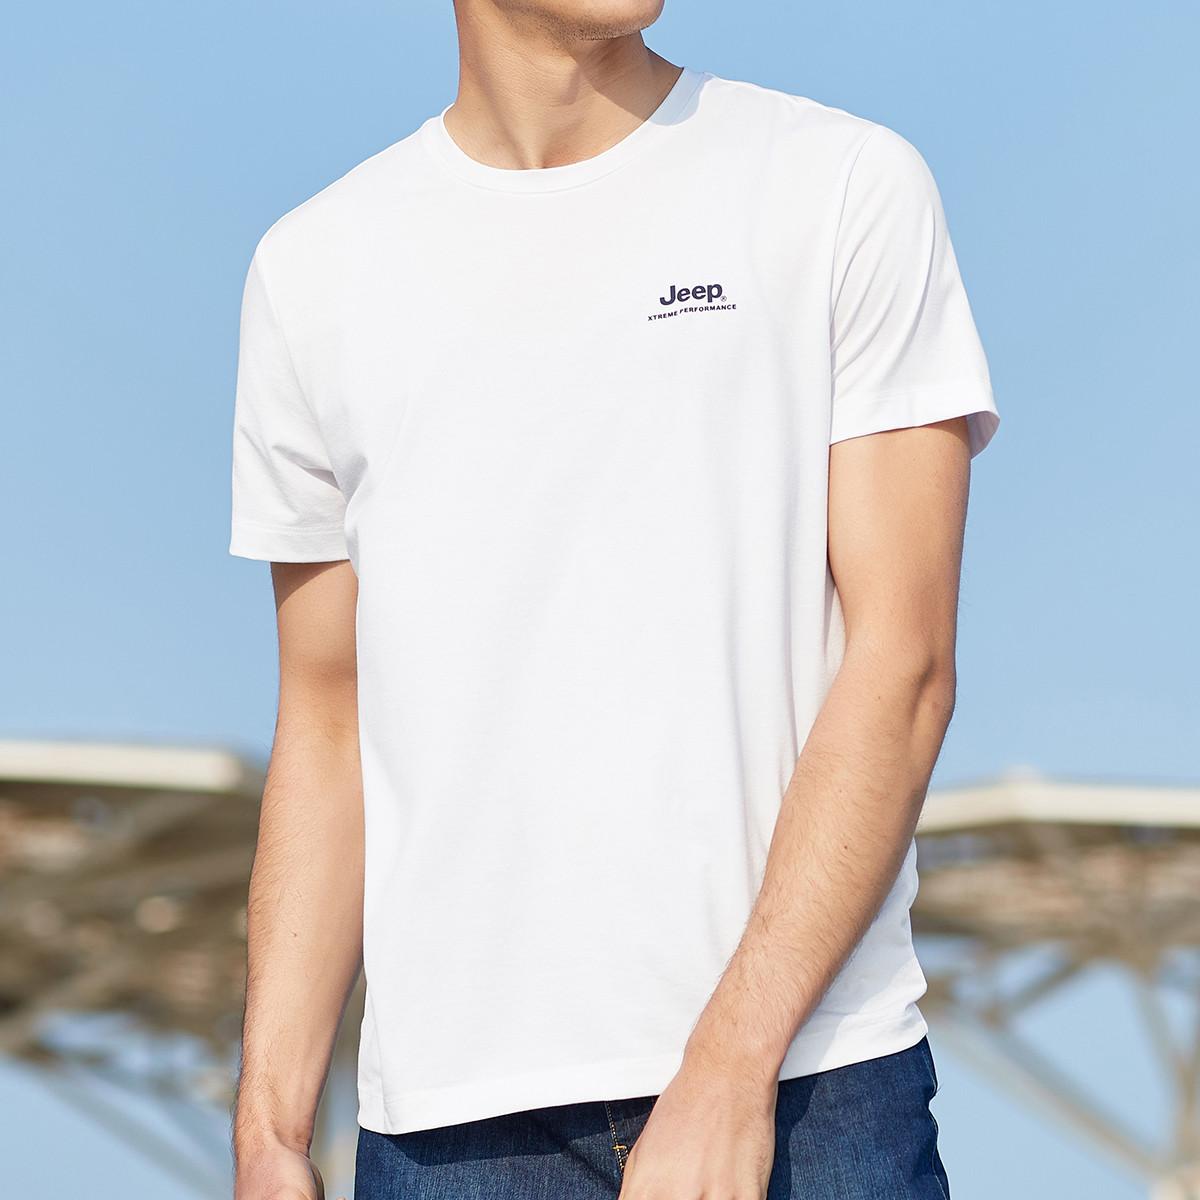 JEEP 吉普 夏季新款男款运动t恤百搭时尚圆领短袖顺滑亲肤透气男式t恤